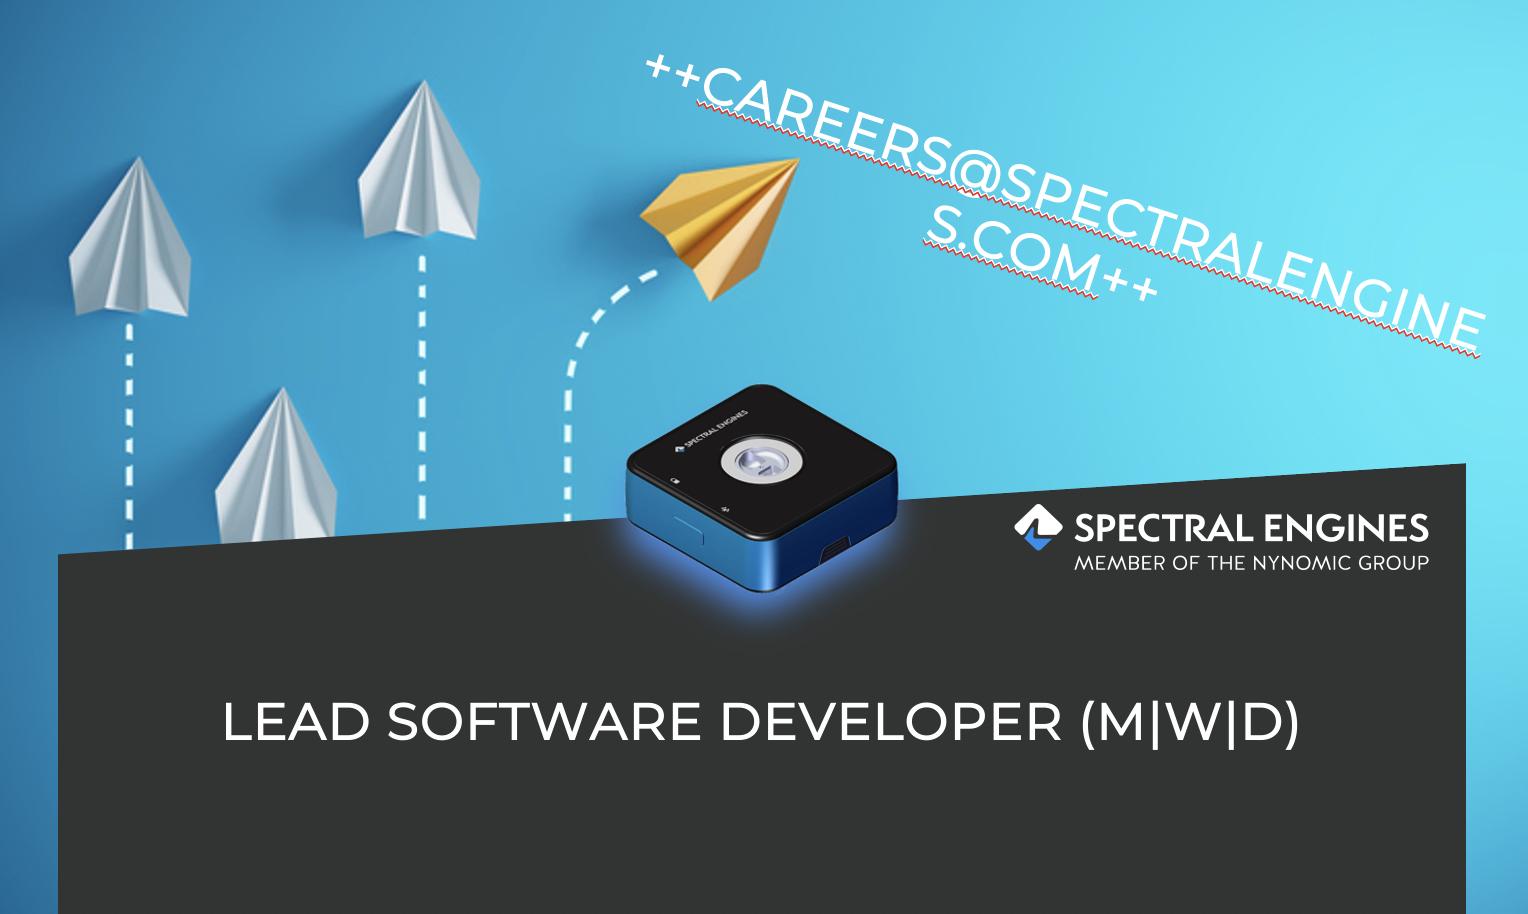 Lead Software Developer